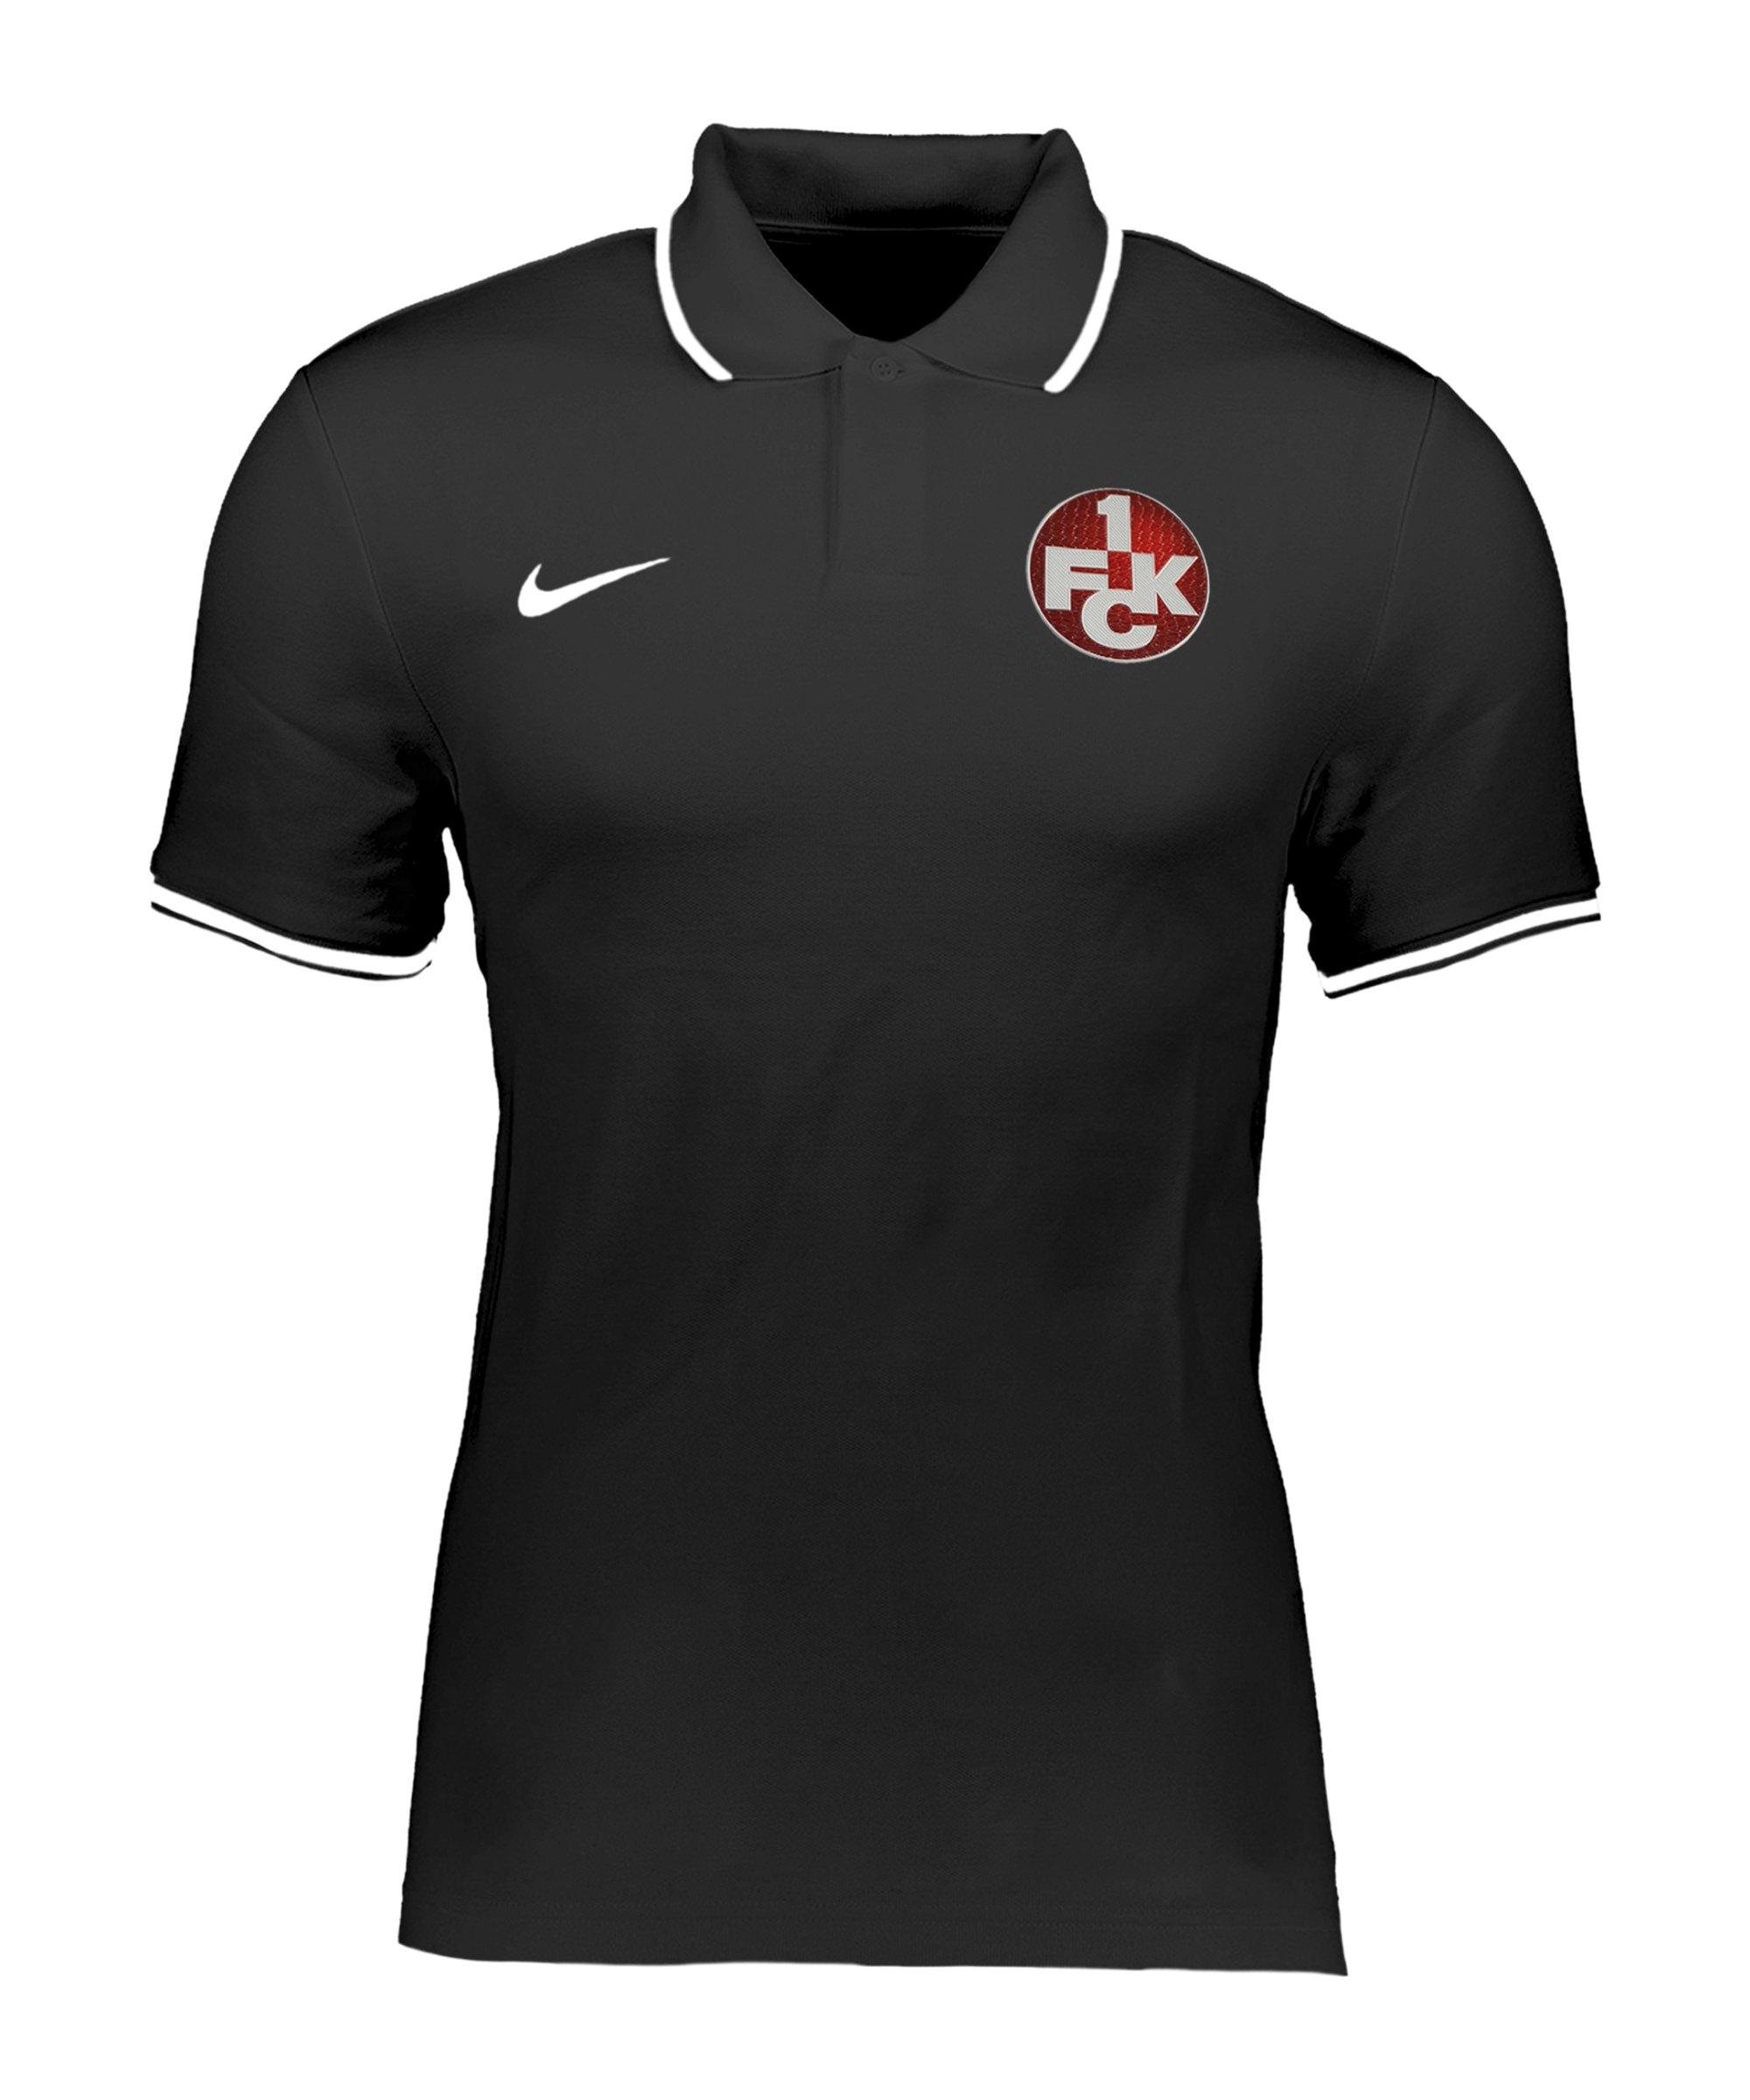 Nike 1. FC Kaiserslautern Poloshirt Kids Schwarz F010 - schwarz